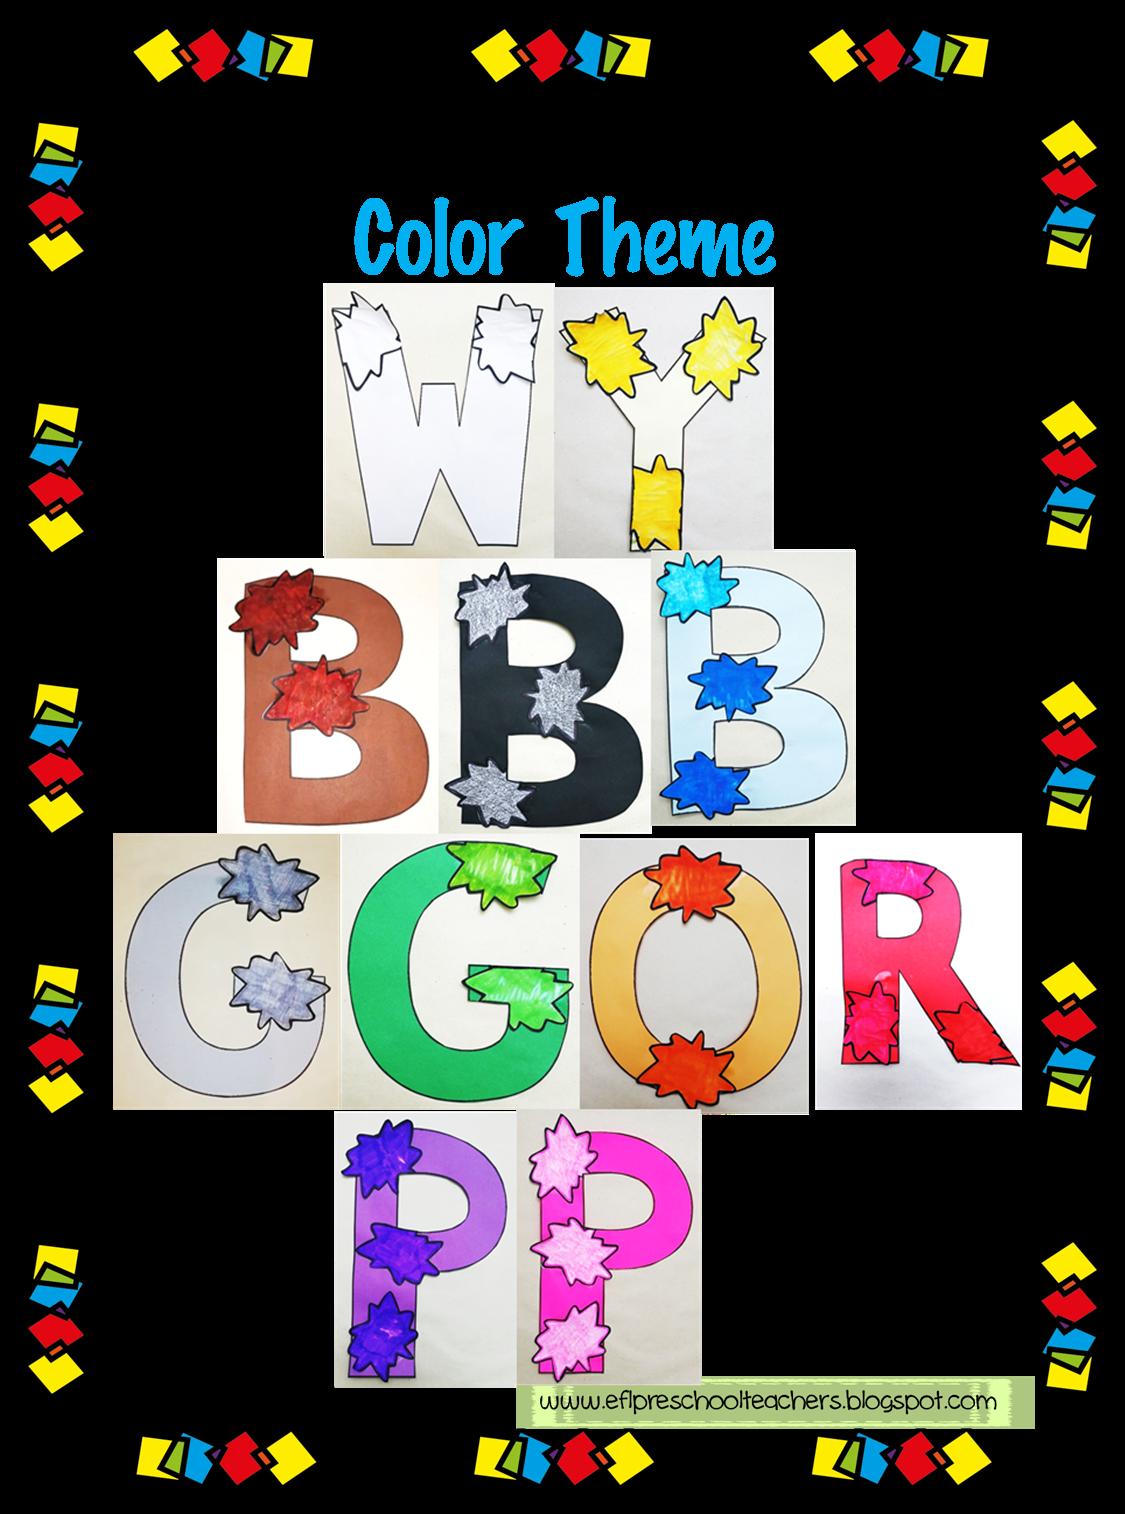 Esl Efl Preschool Teachers Color Worksheets